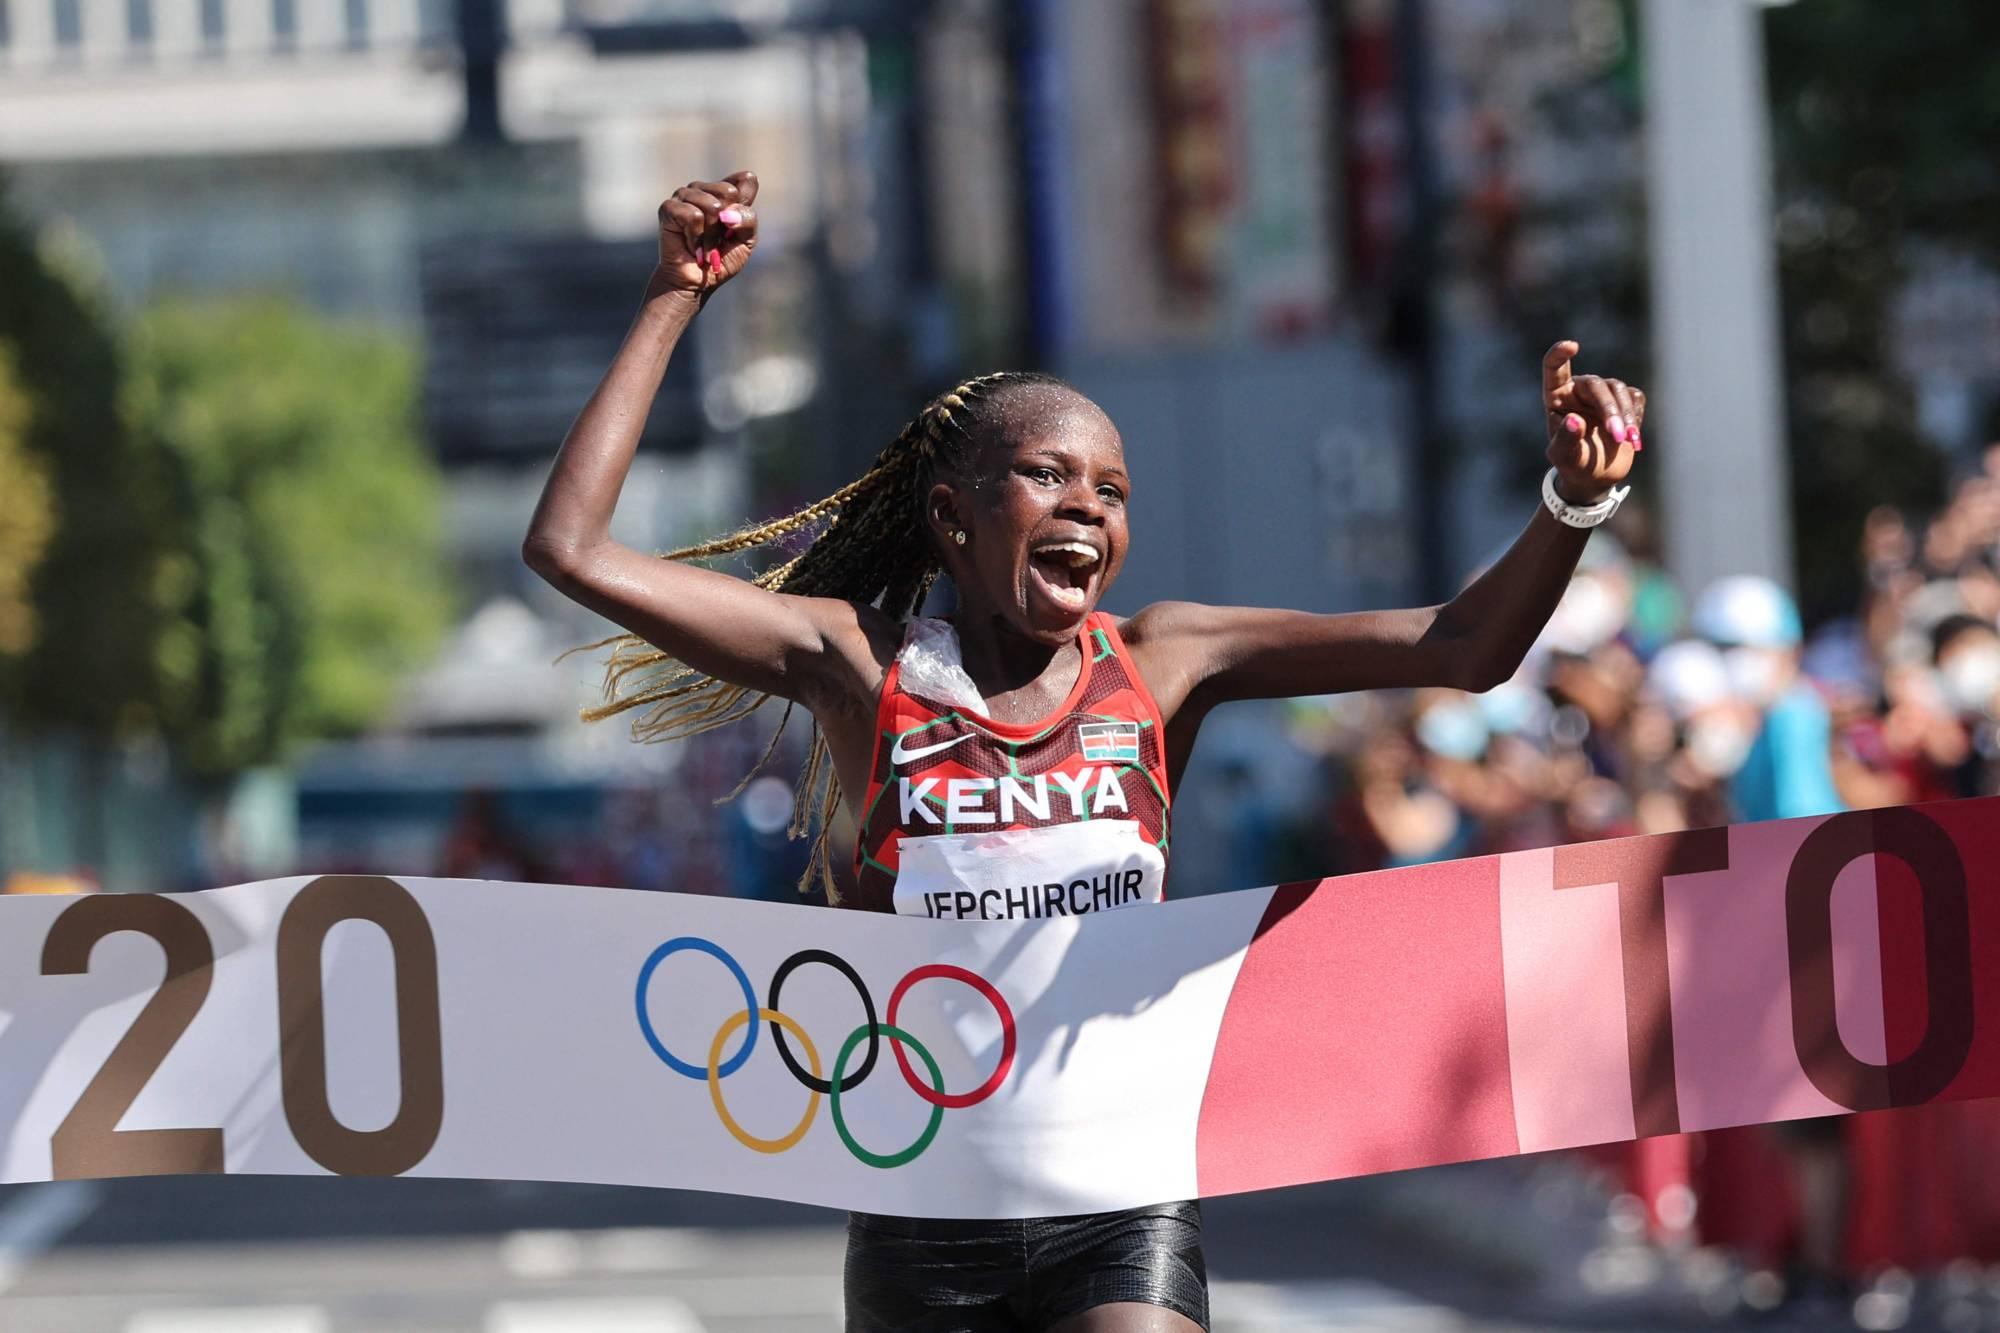 Tokyo 2020: Kenya's Peres Jepchirchir beats World Record Holder to Claim Marathon Gold